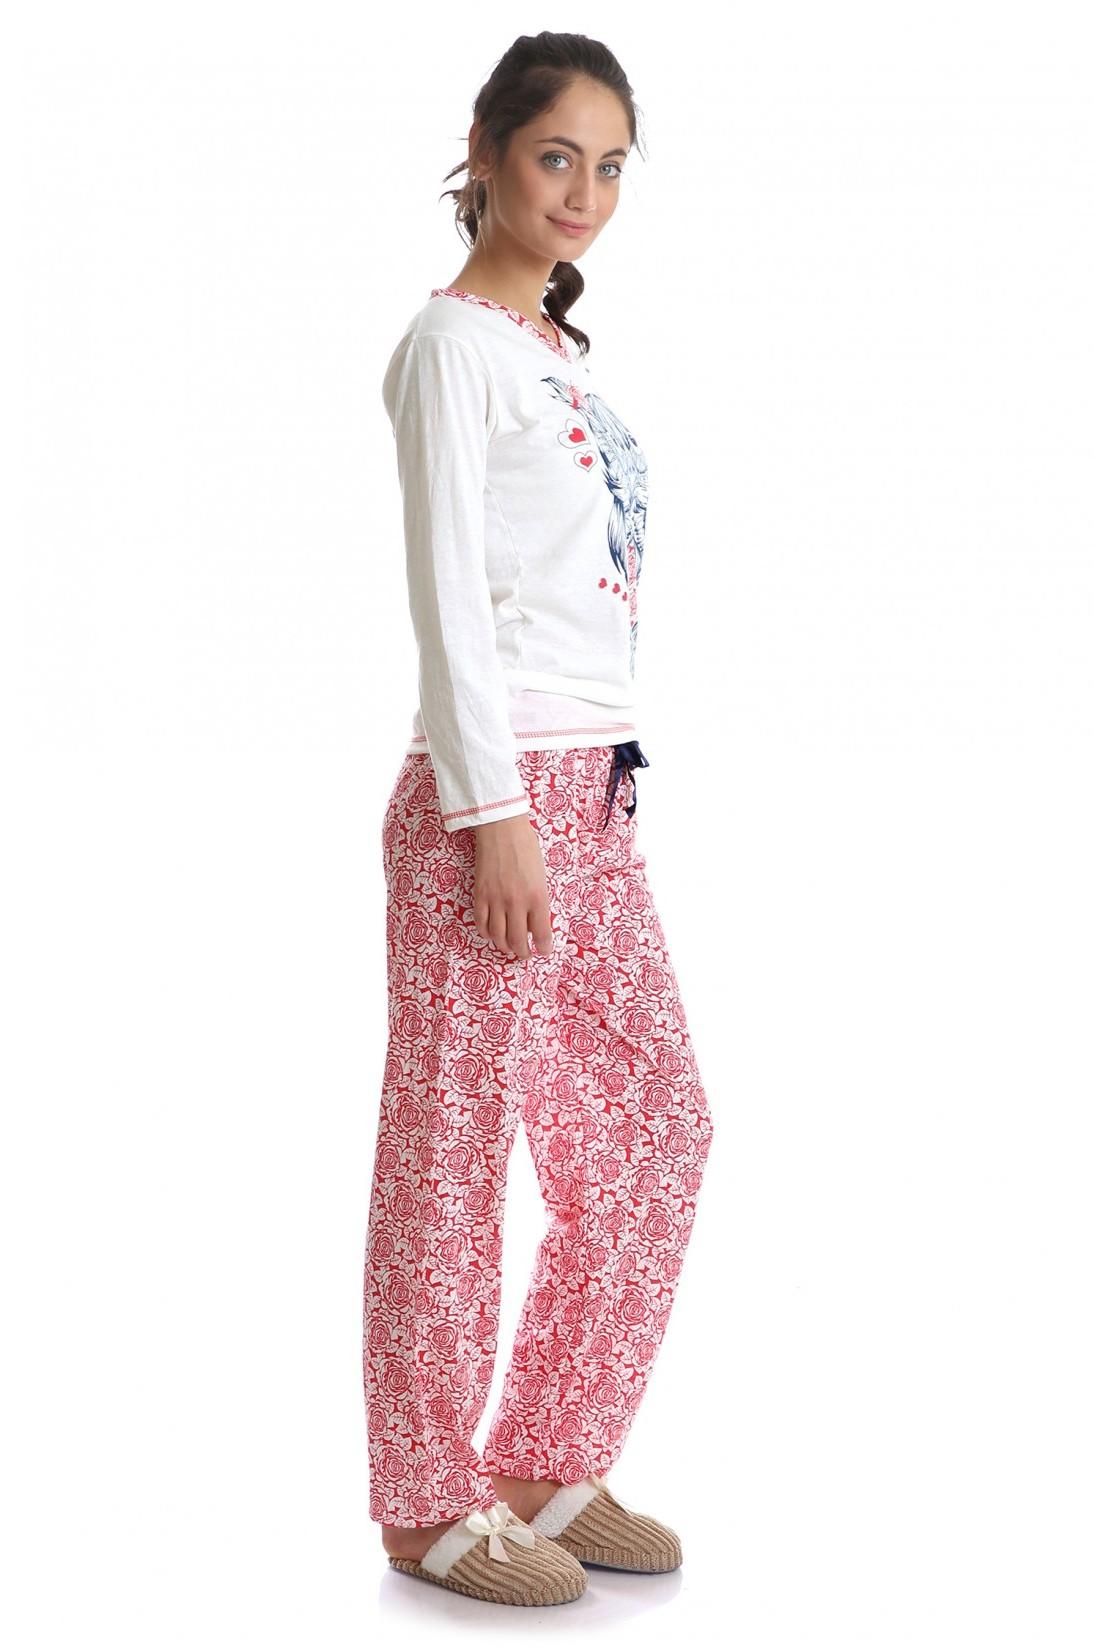 a11e59e5adb Дамска Пижама - Син Бухал/Червени Рози | Пижами | Дамски пижами ...